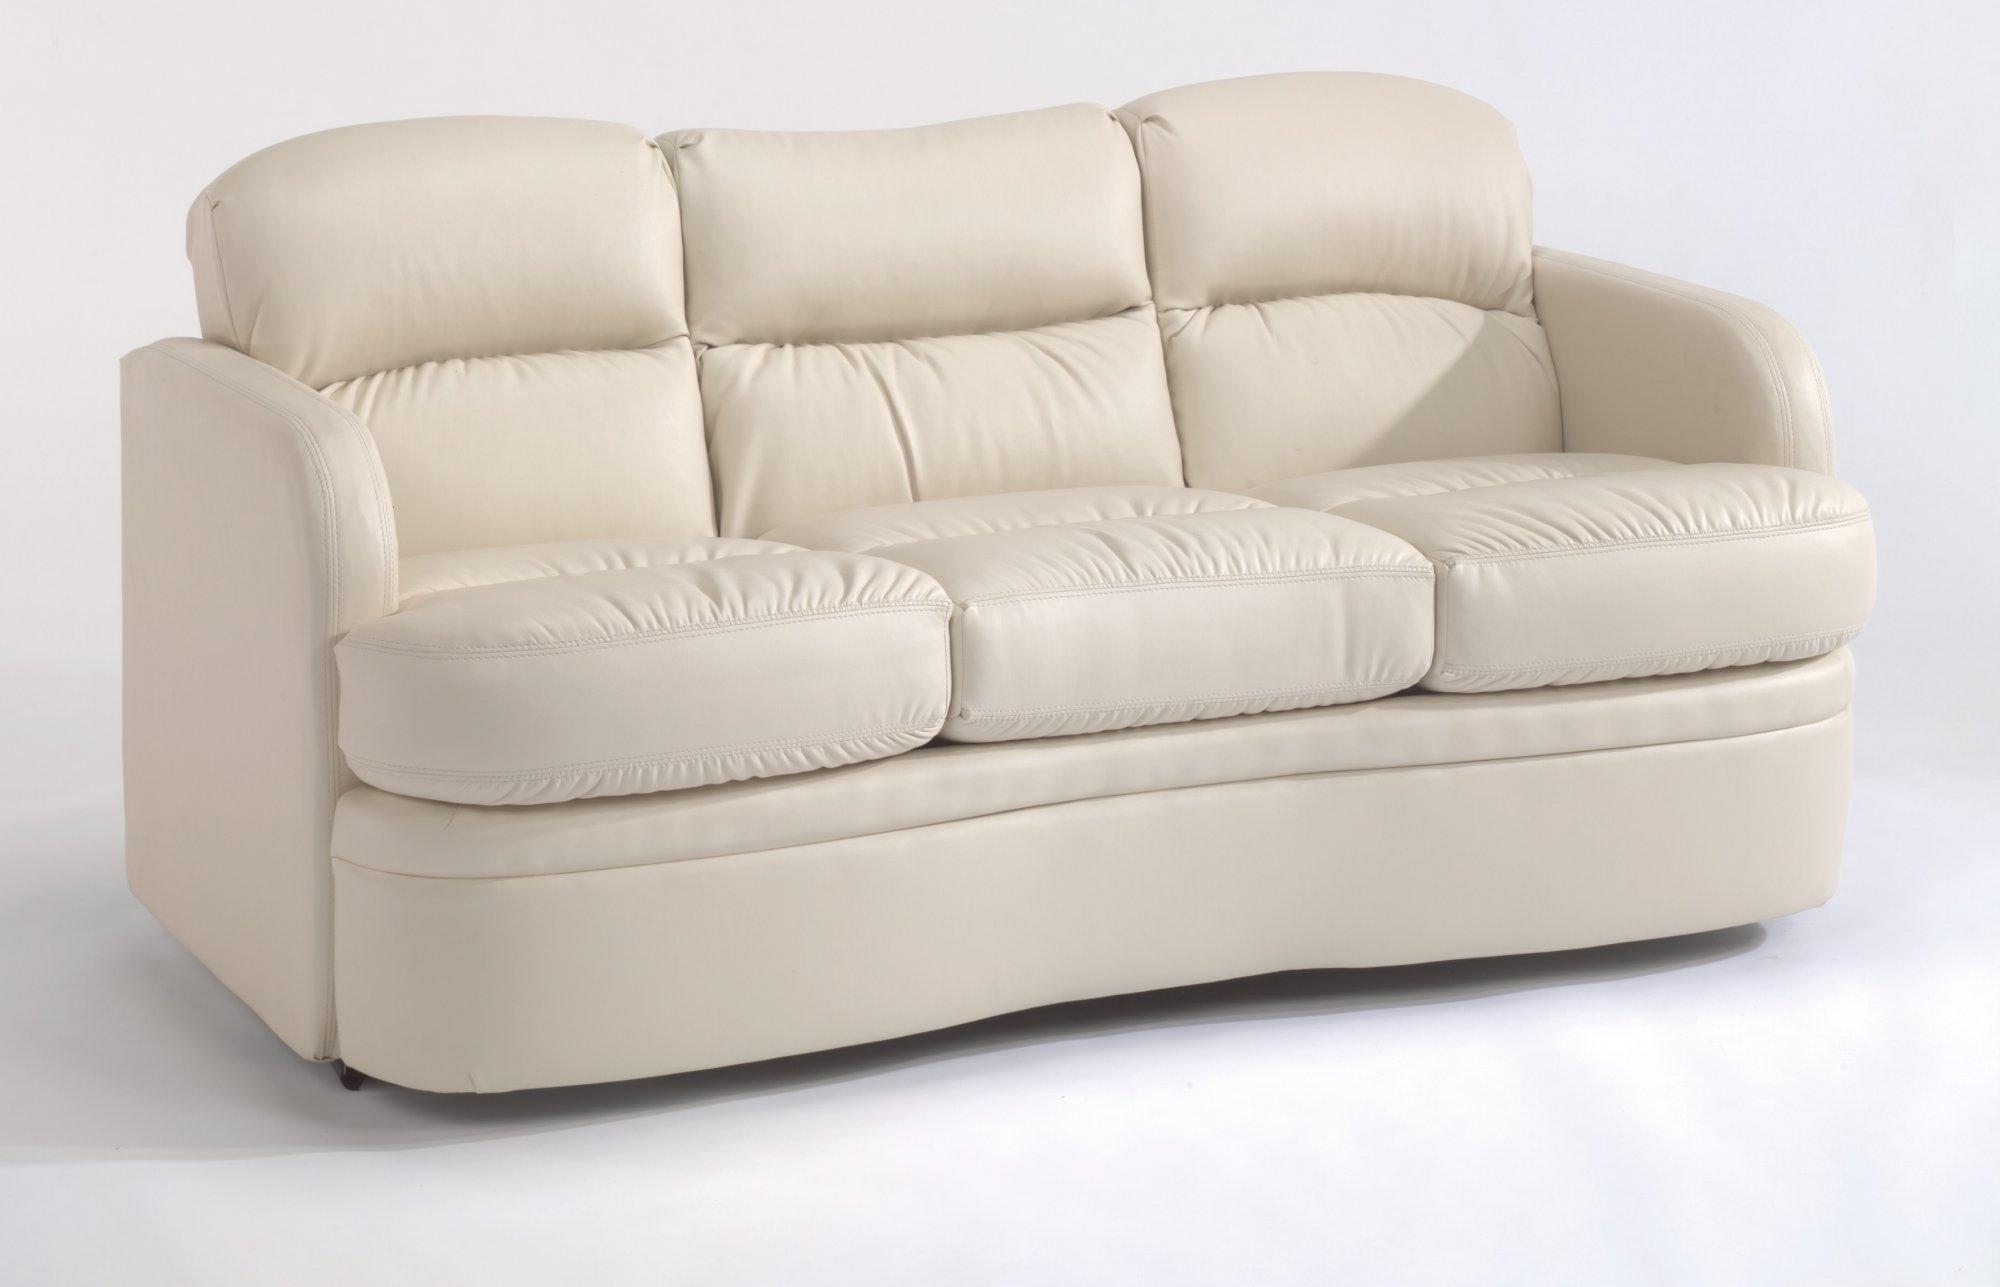 Flexsteel Bluestem  Motor Home Convertible Sofa Sleeper